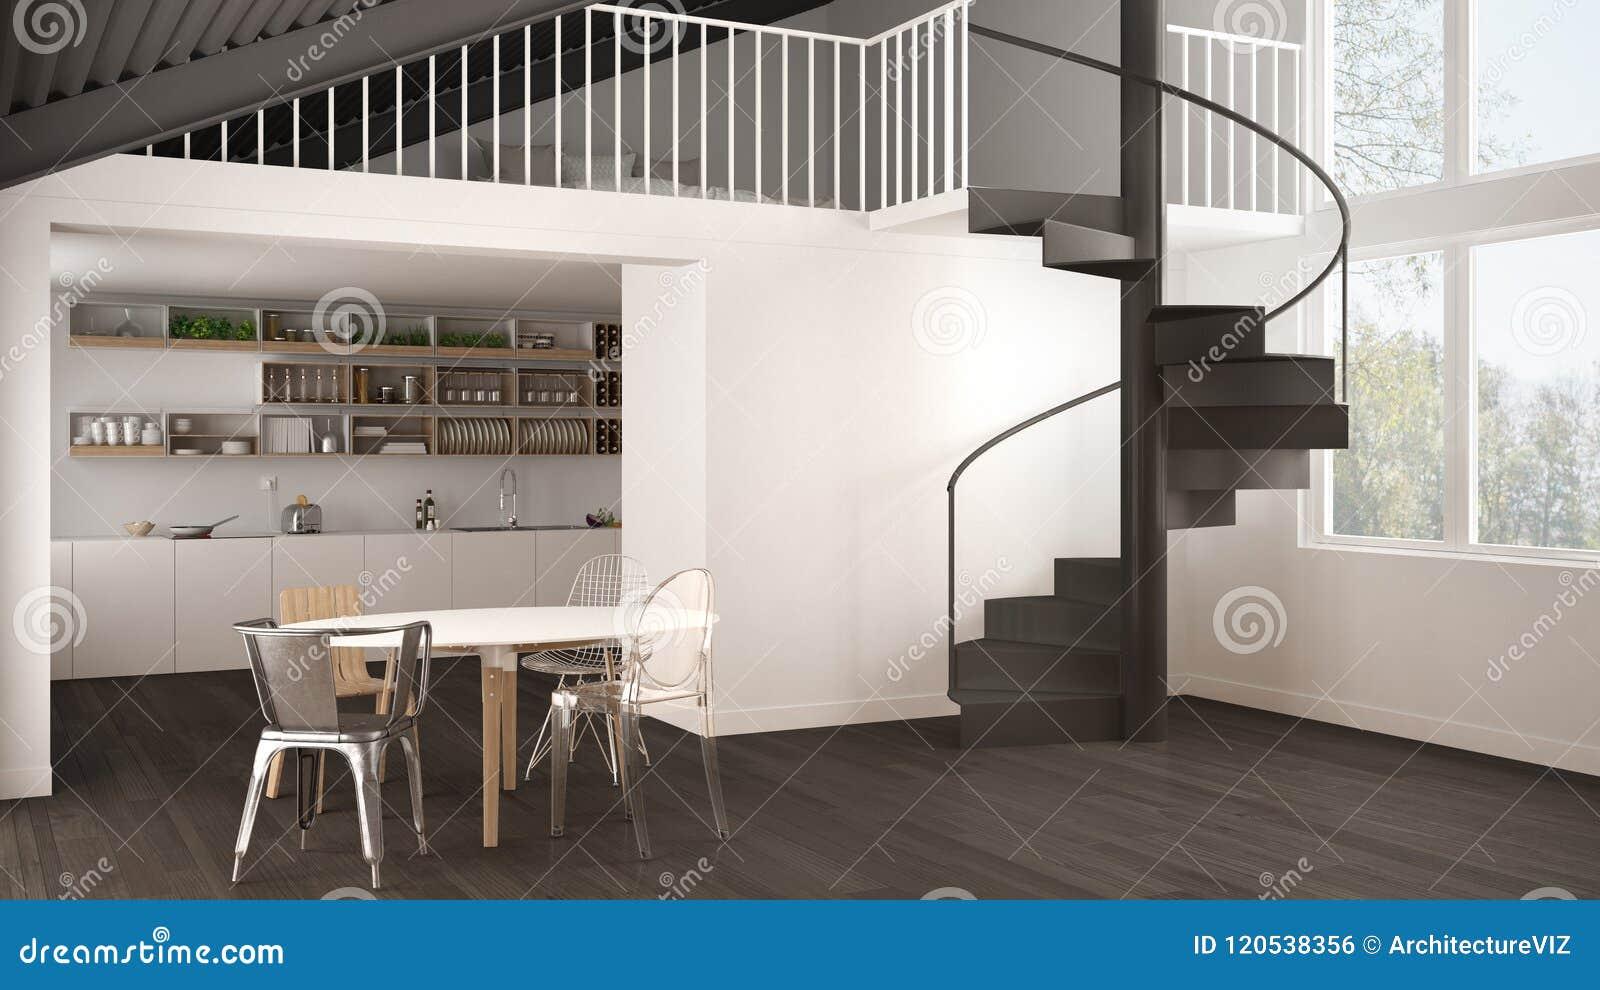 Minimalist White And Gray Kitchen With Mezzanine And Modern ...